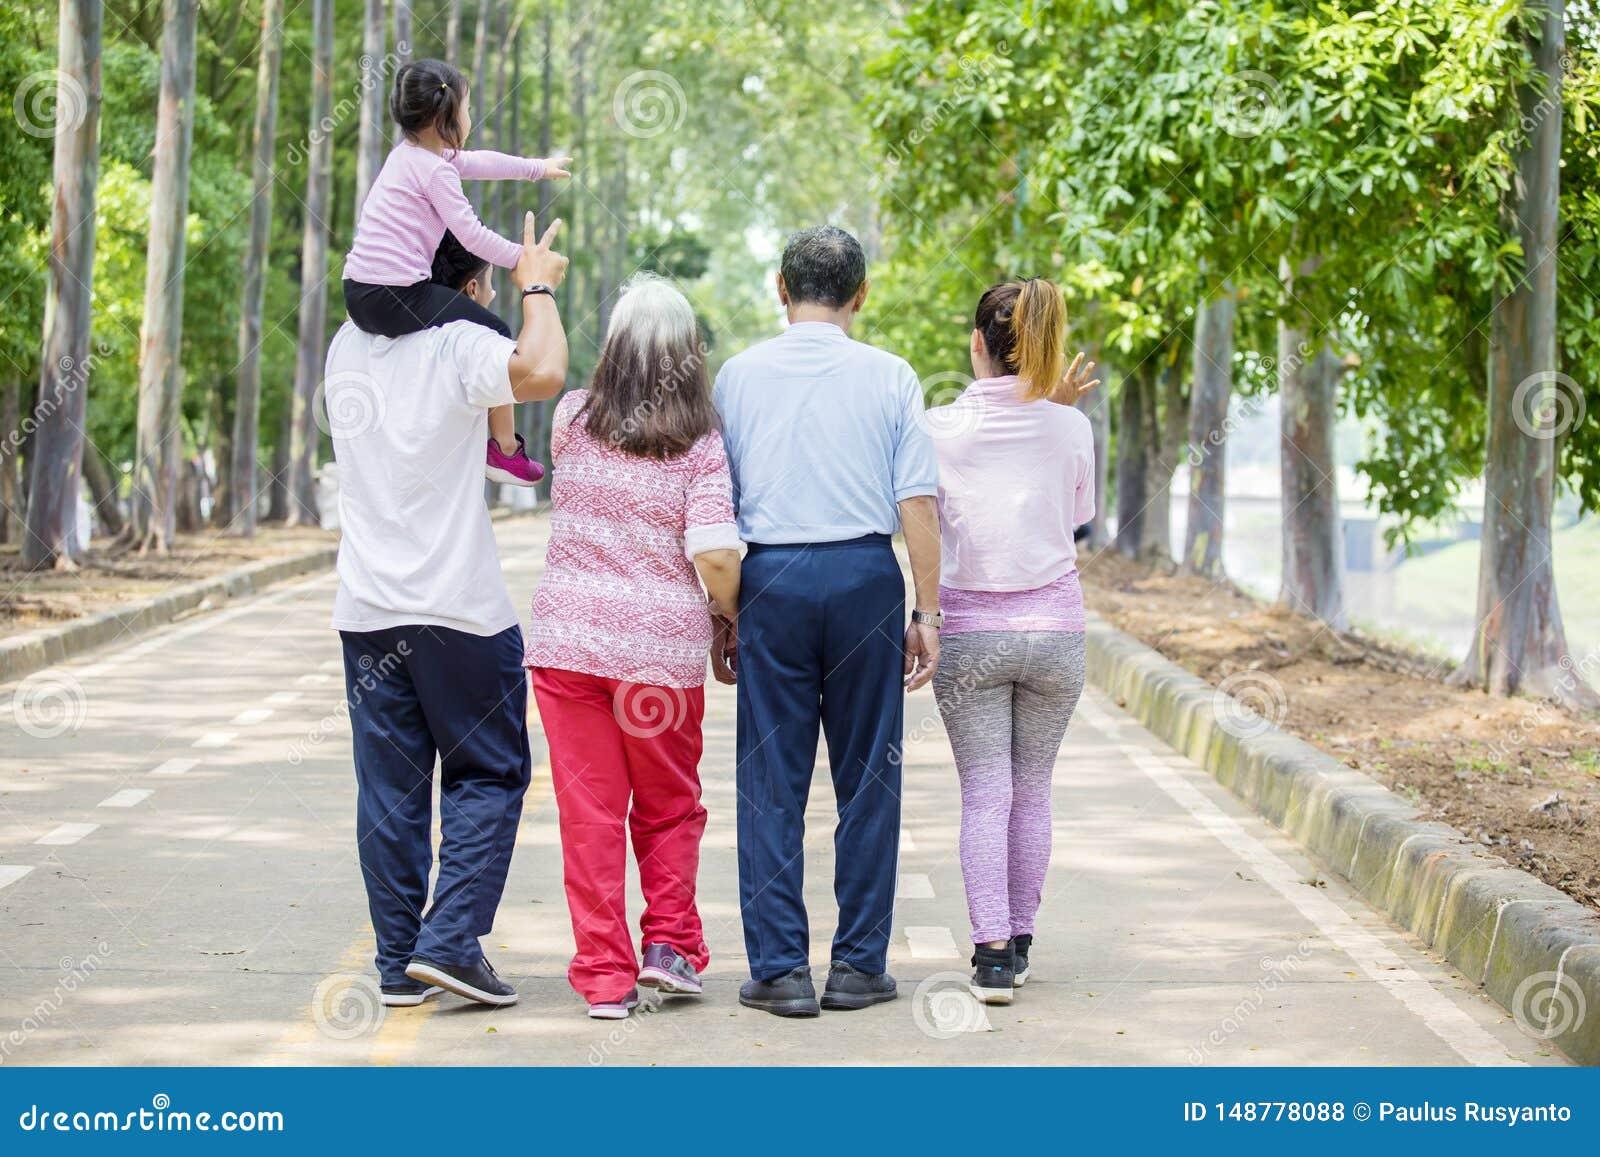 Vista posterior de la familia extensa que camina en el camino